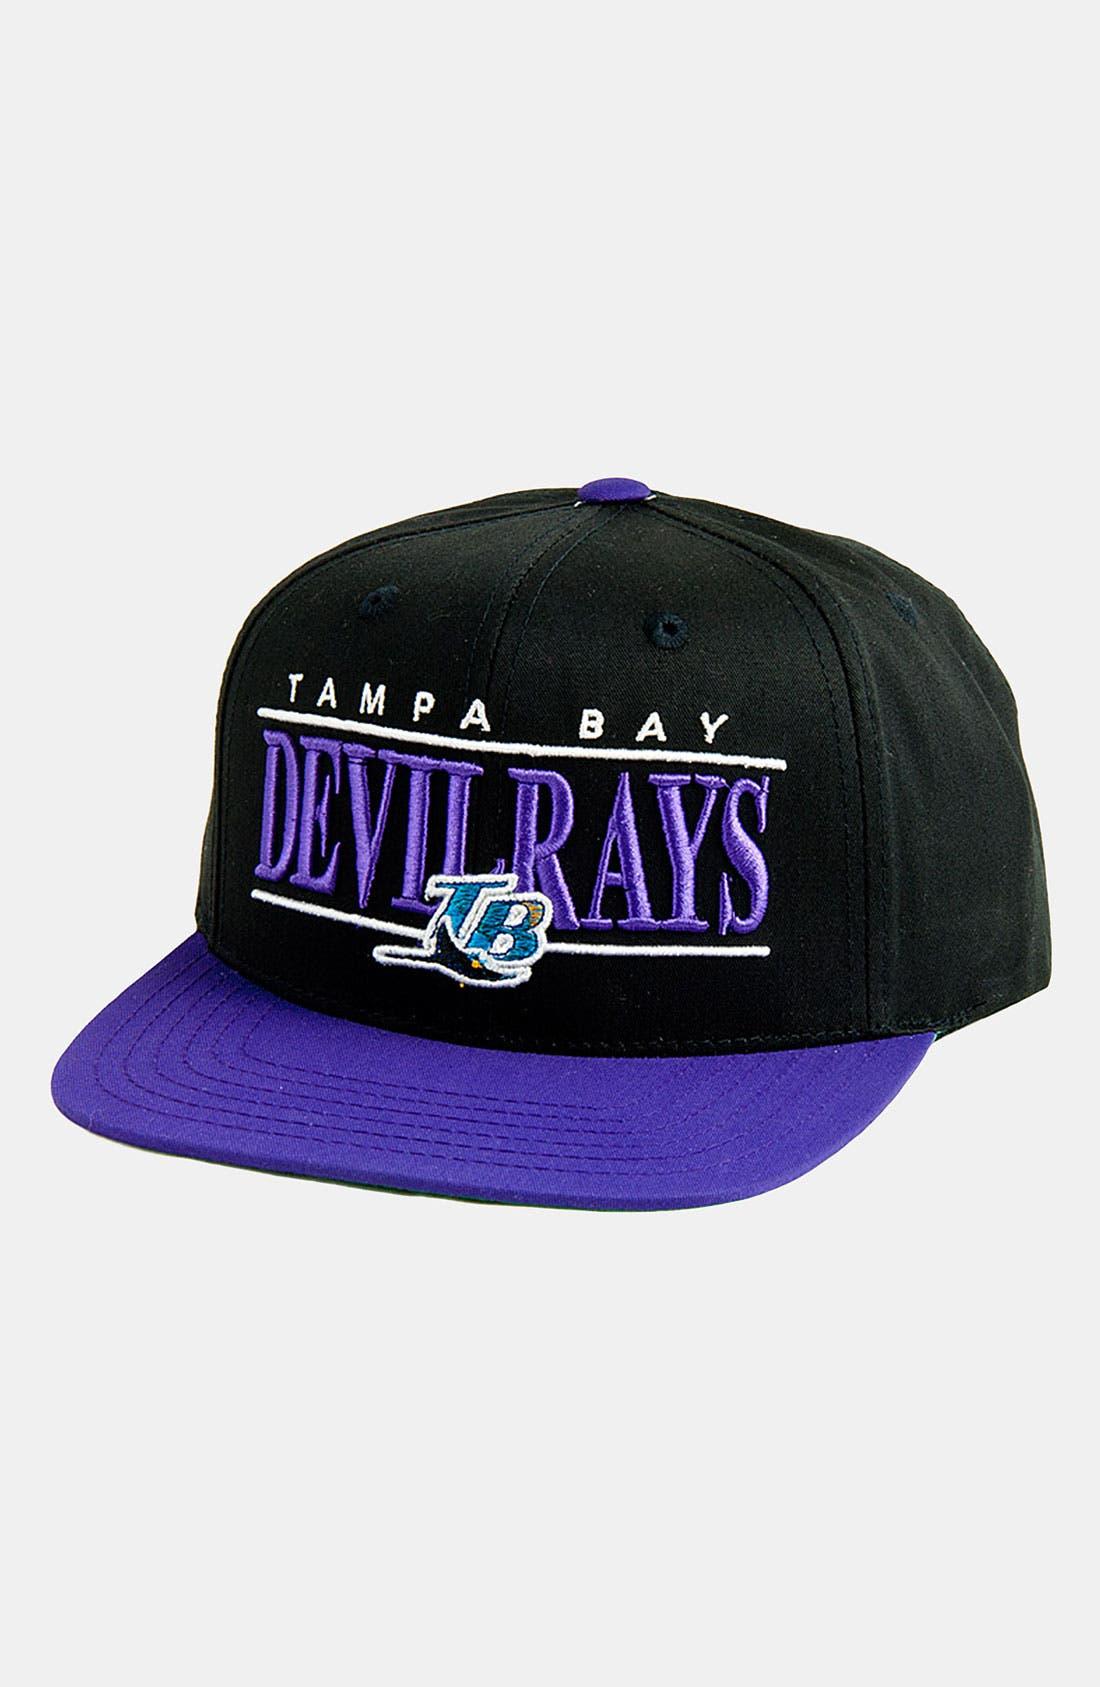 Main Image - American Needle 'Tampa Ray Devil Rays - Nineties' Twill Snapback Baseball Cap